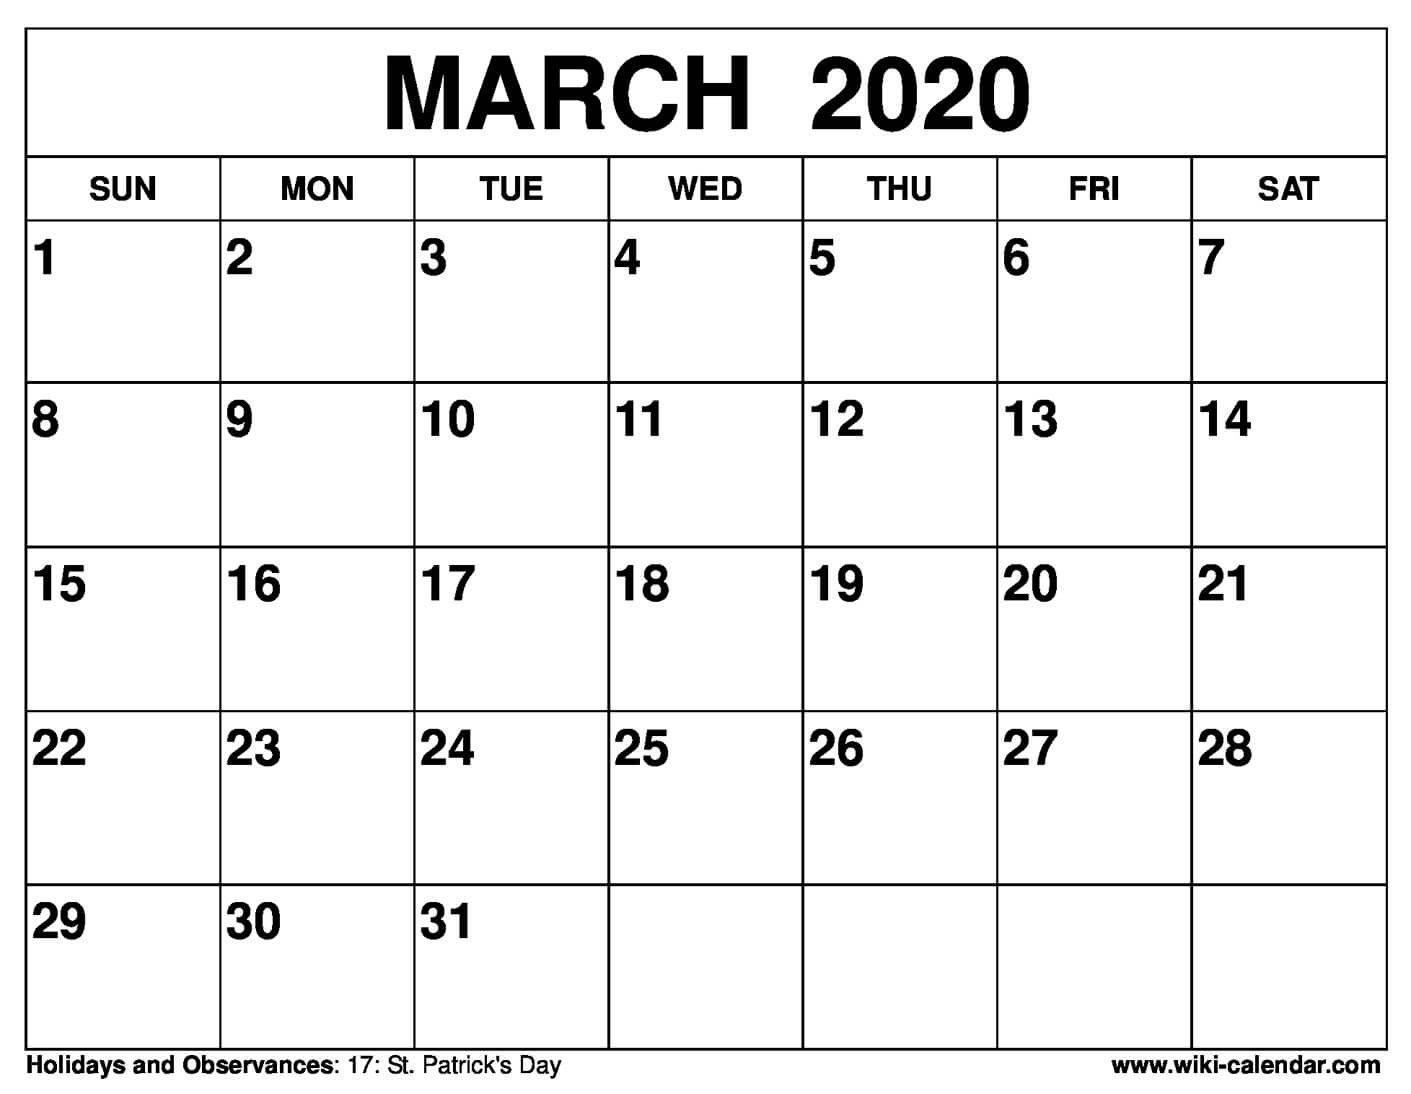 Free Printable March 2020 Calendar – Wiki Calendar How To Print A Calendar Full Page 8 X 11